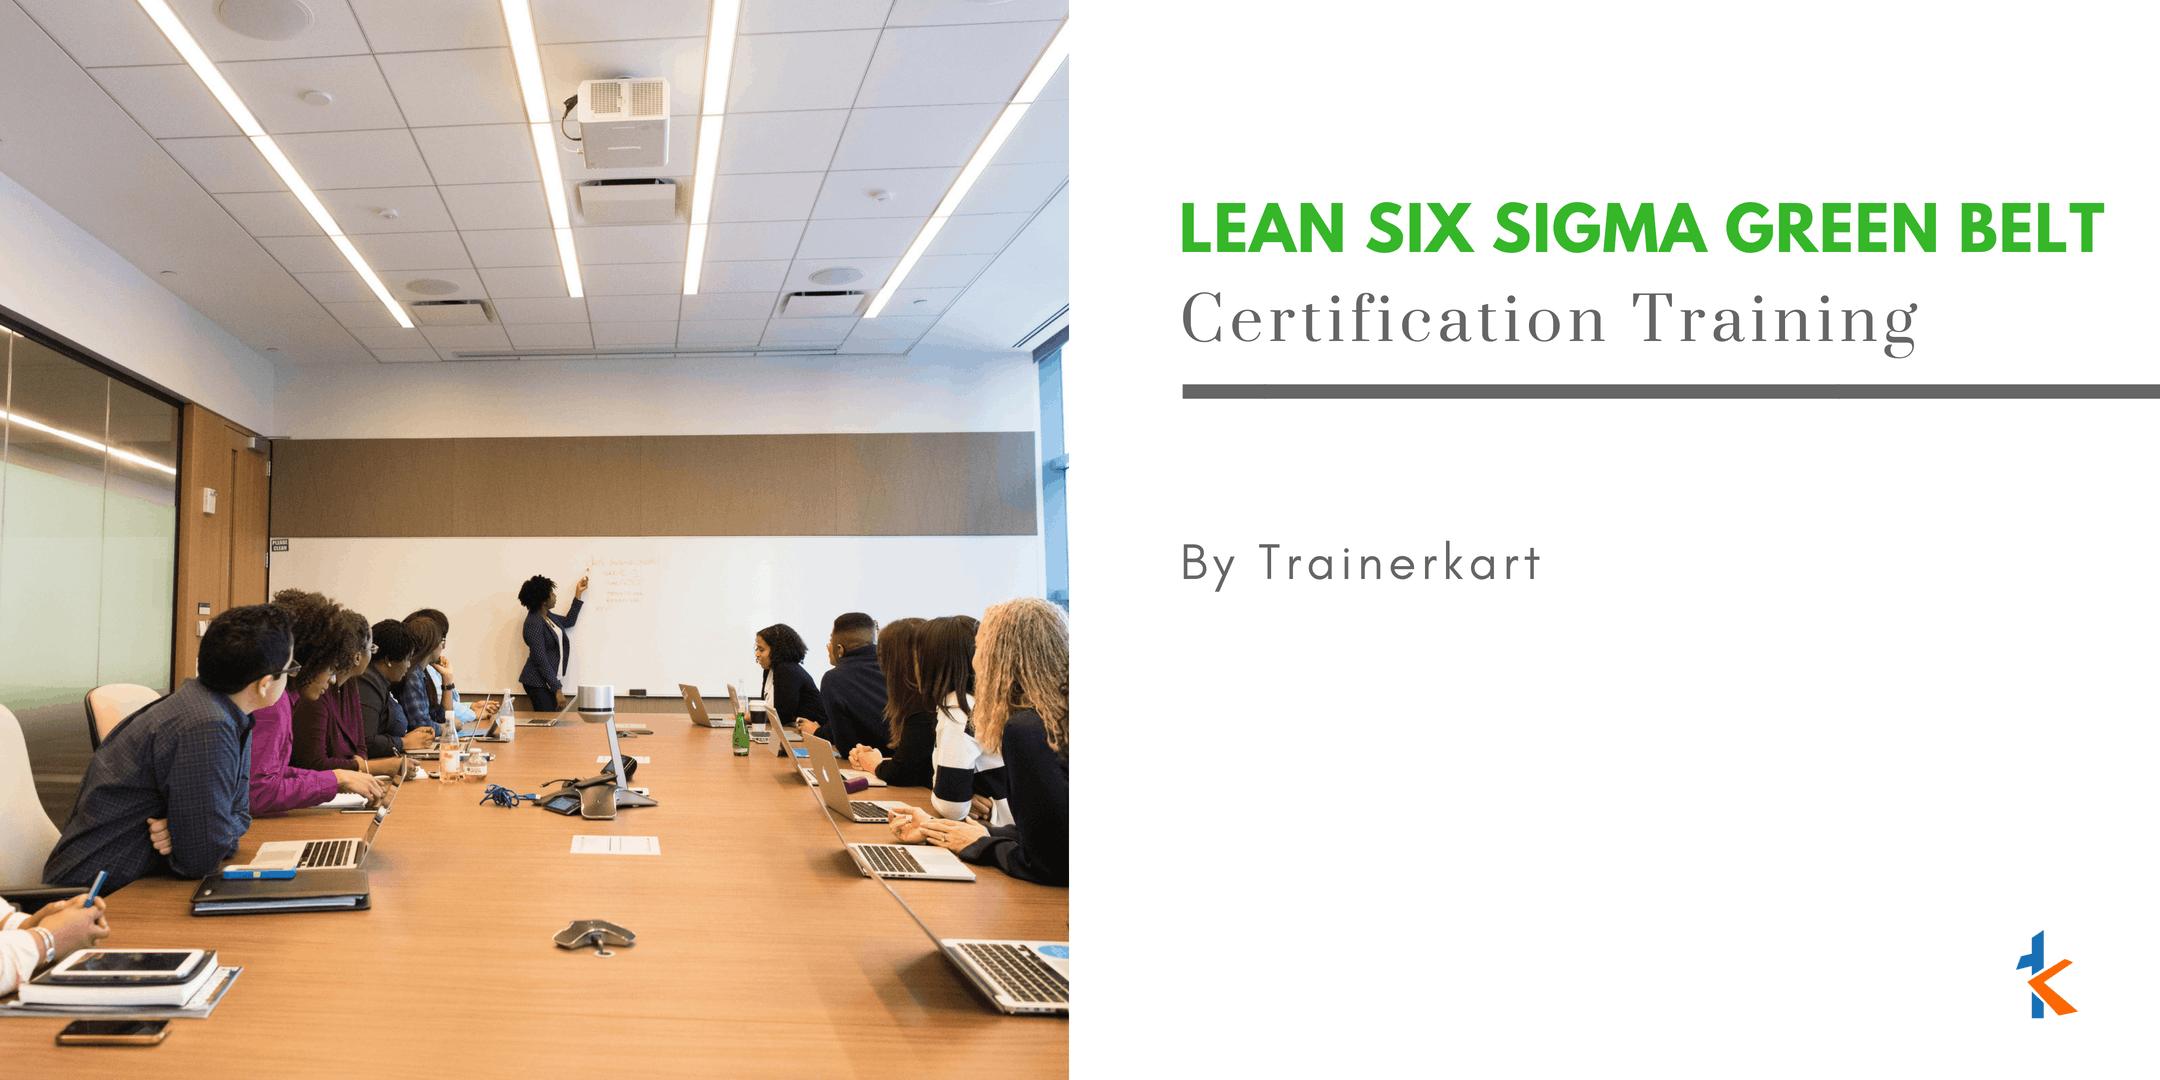 Lean Six Sigma Green Belt Training In Roanoke Va At Business Hotel